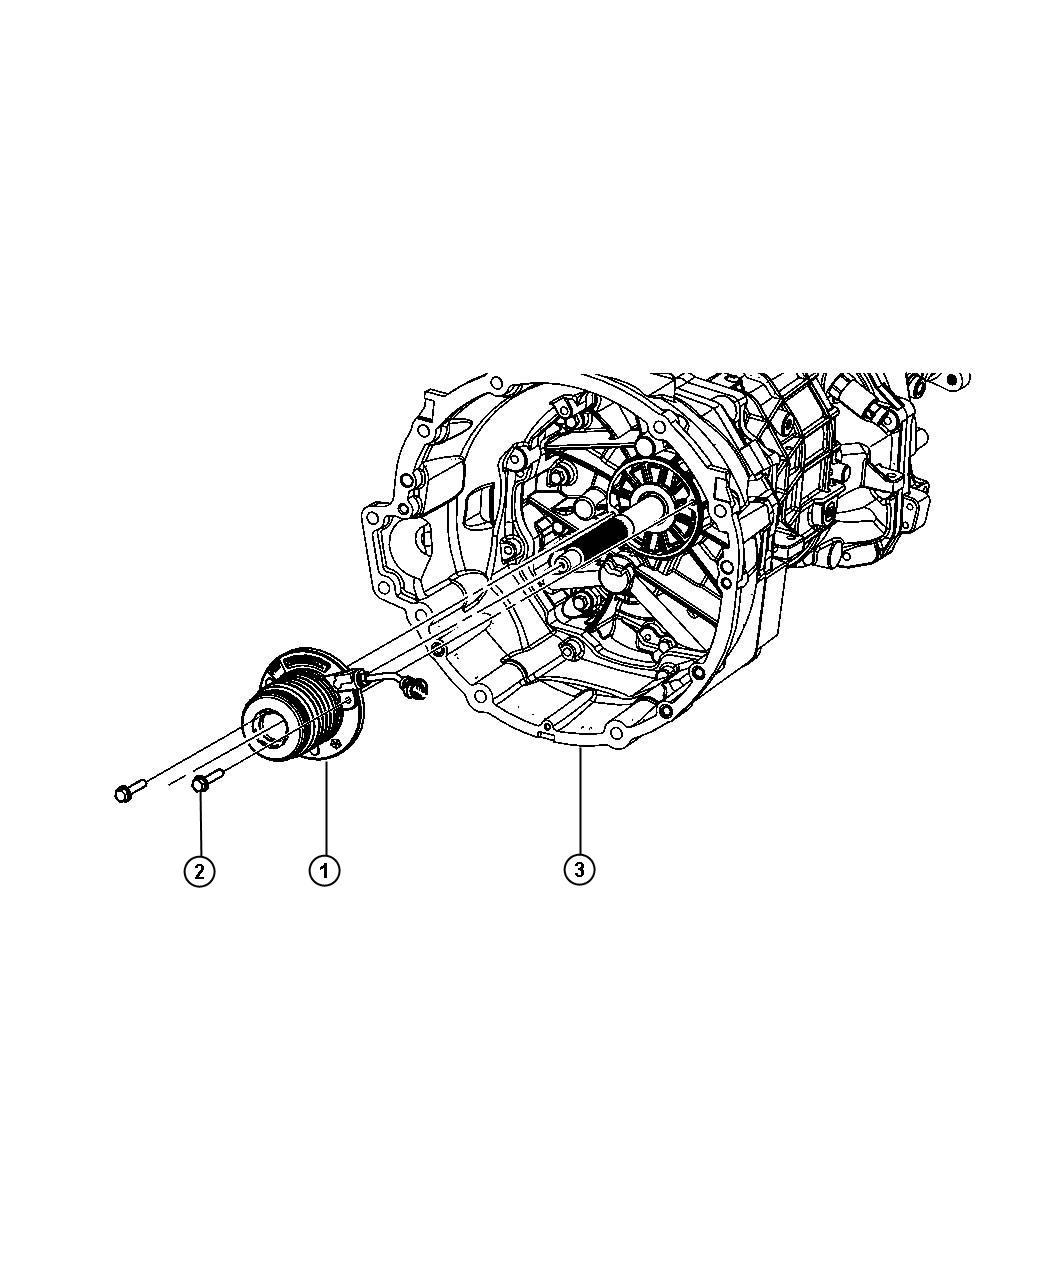 2010 Dodge Actuator assembly. Clutch concentric slave